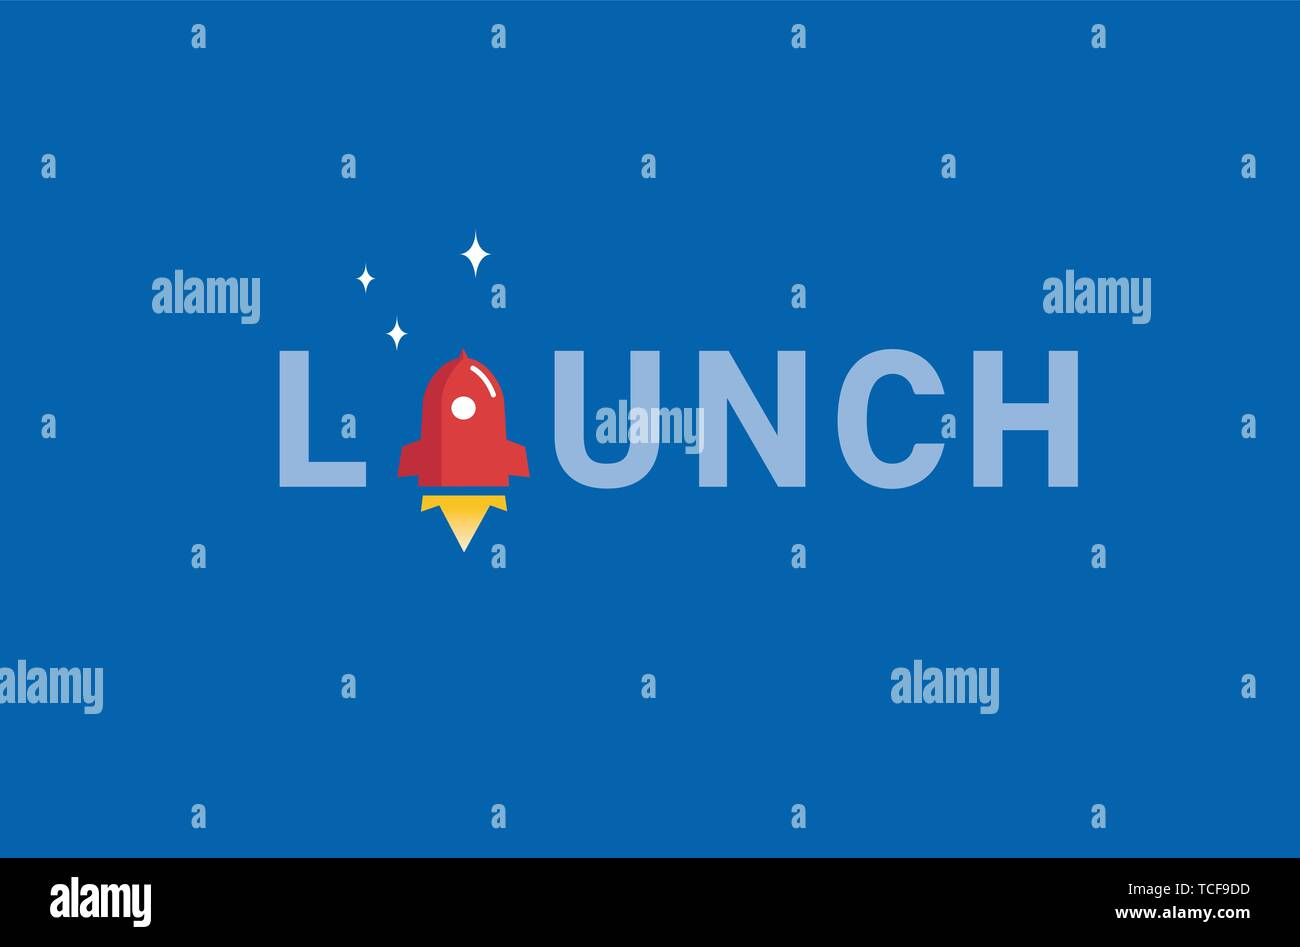 Development Entrepreneur Spaceship Rocket Graphic Stock Photos